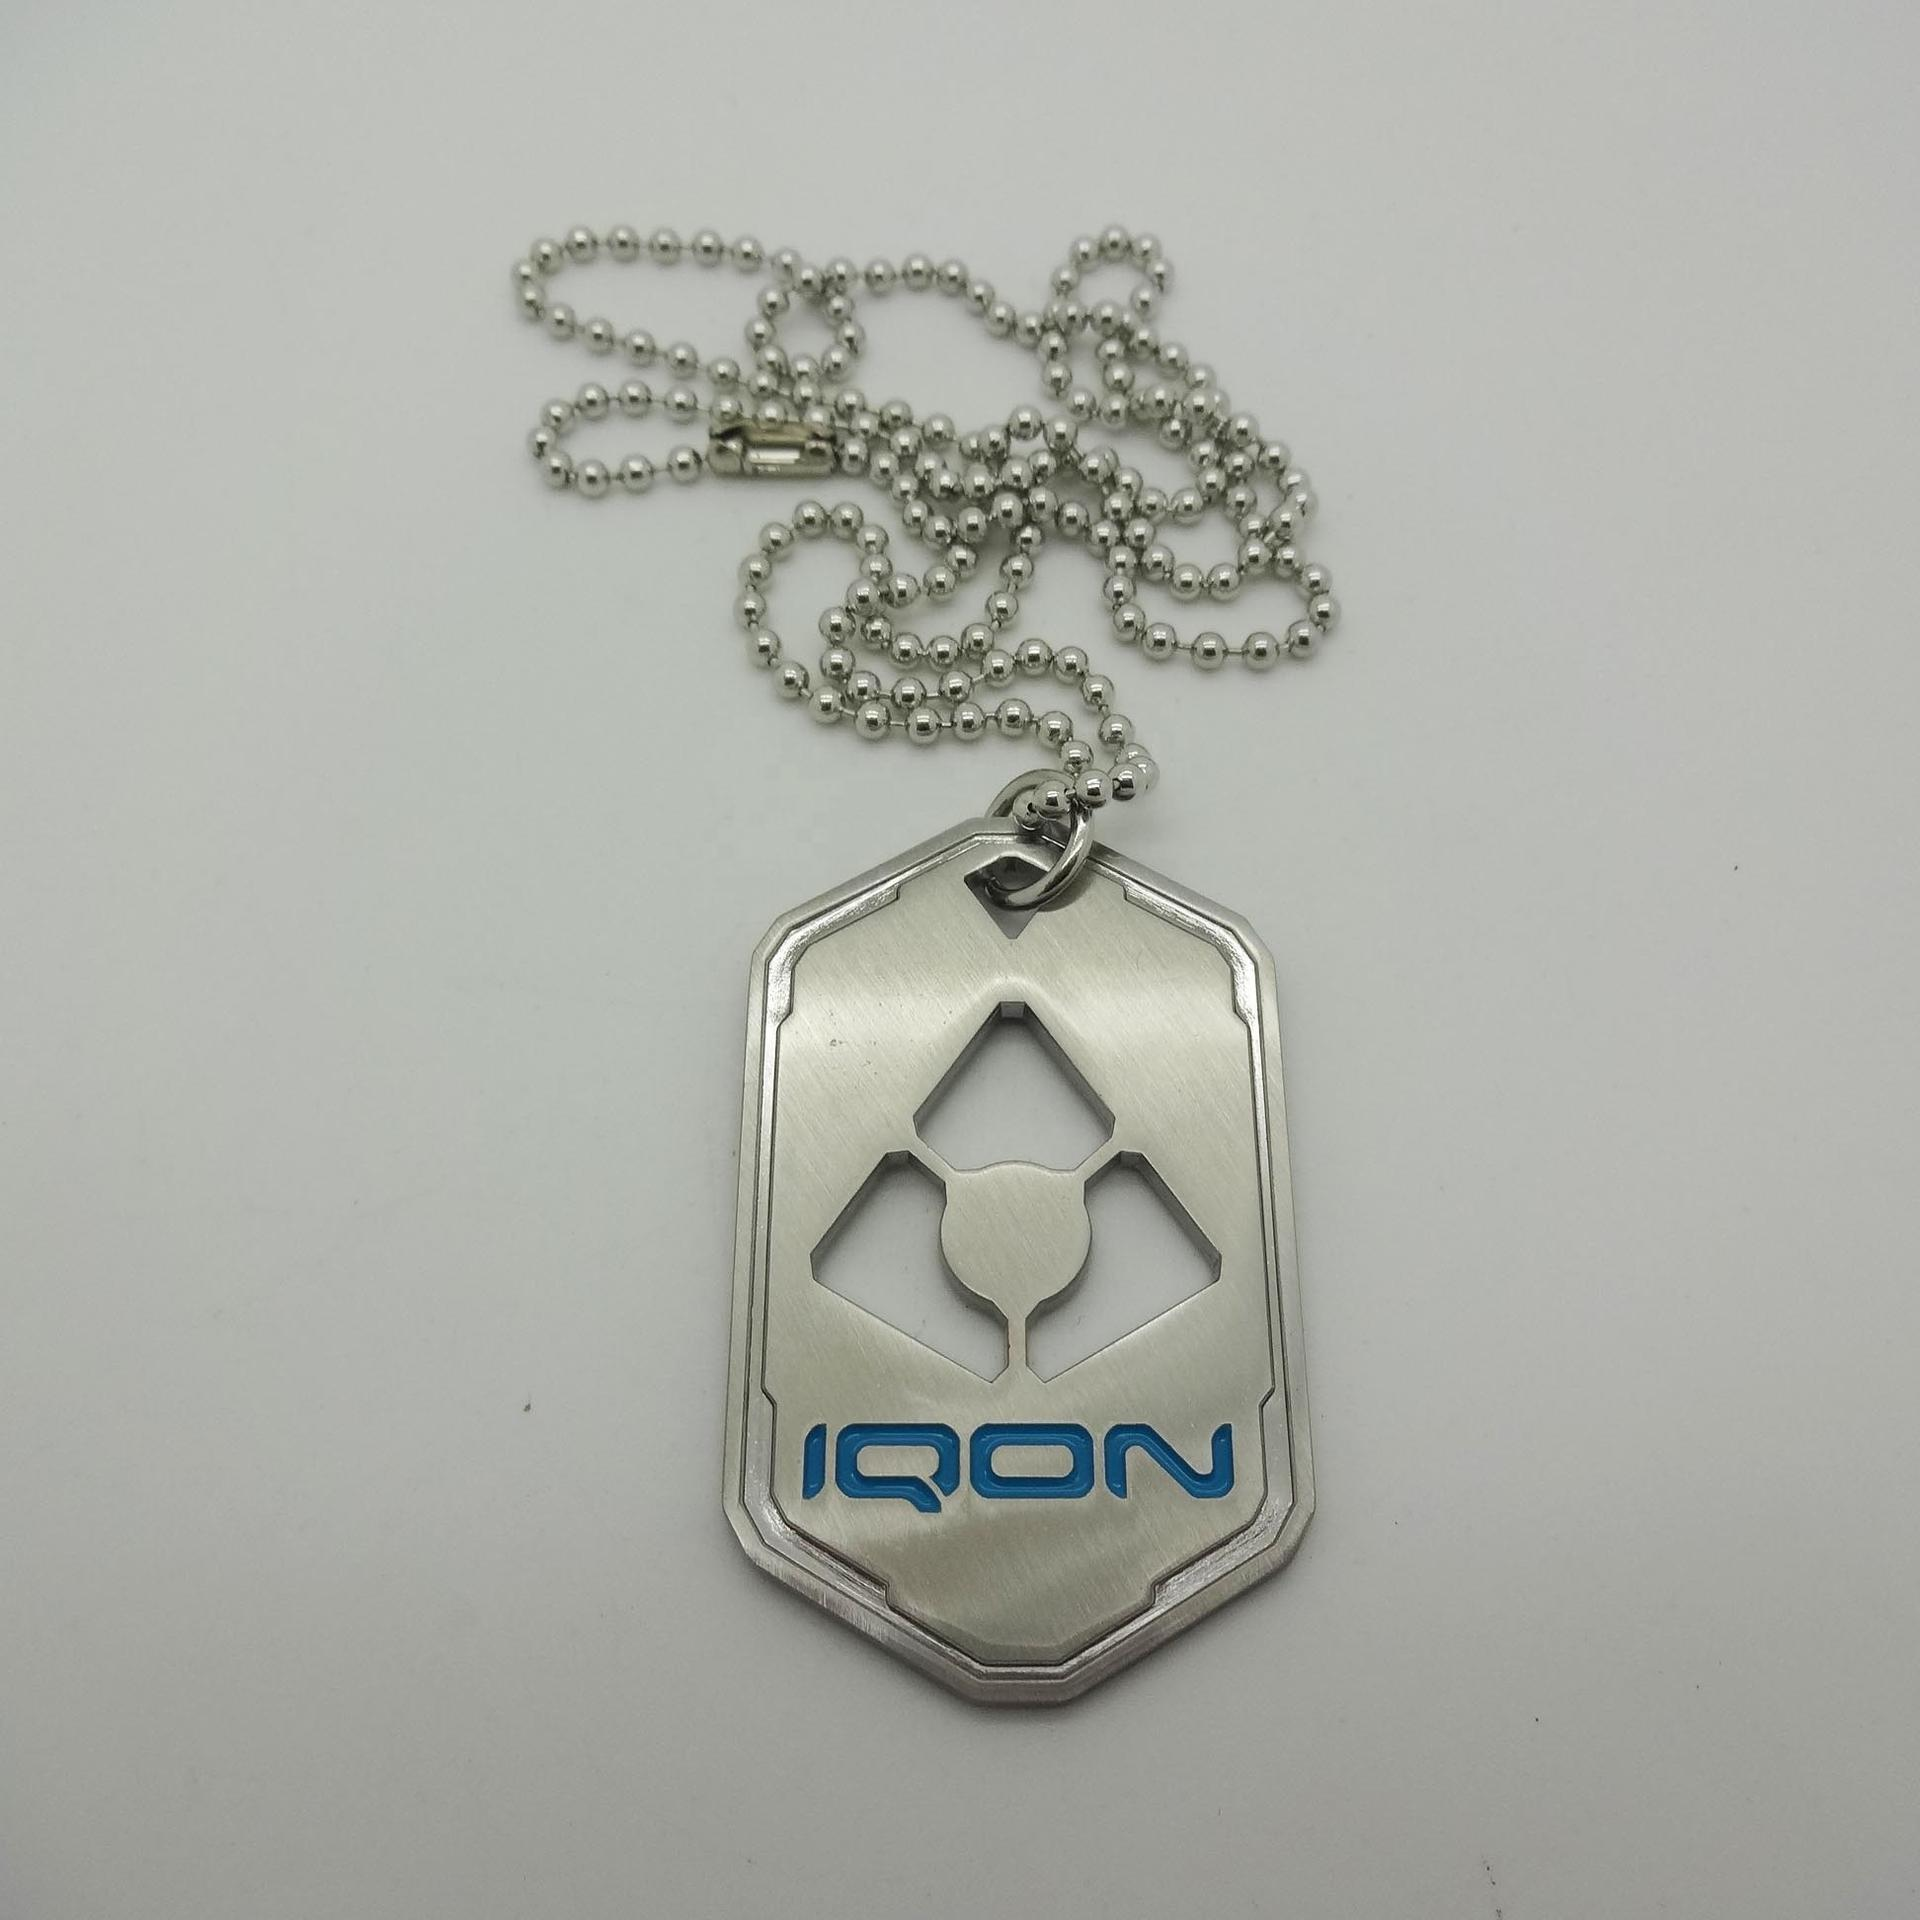 Metal zinc alloy custom shape military army dog tag with enamel filled